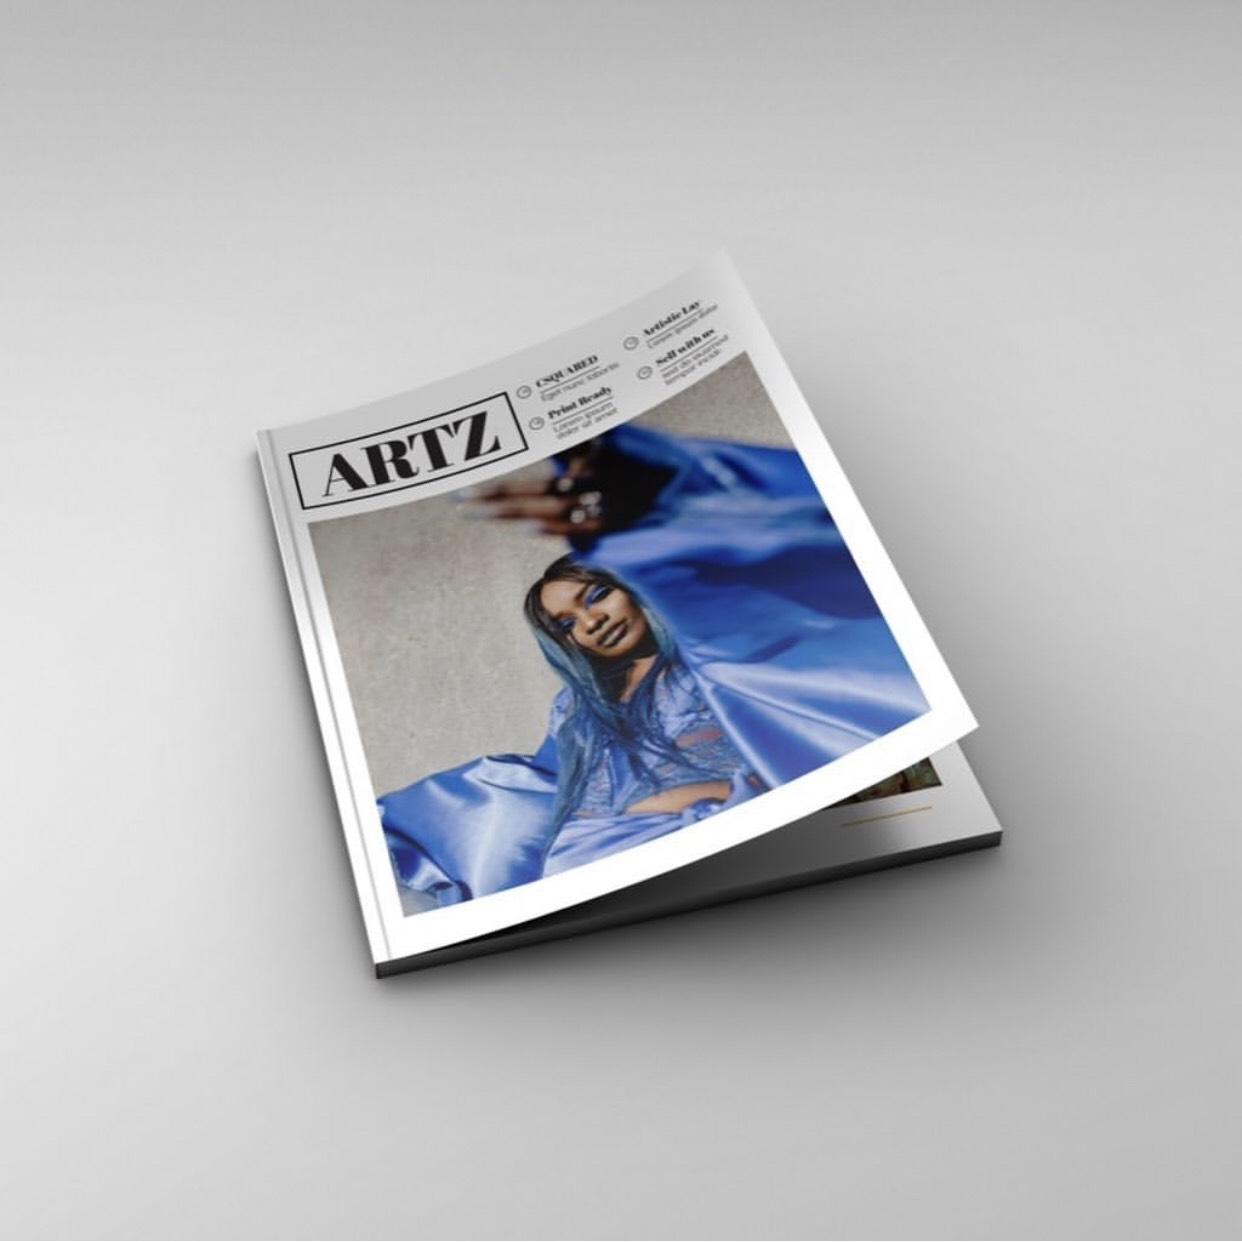 ARTZ Magazine